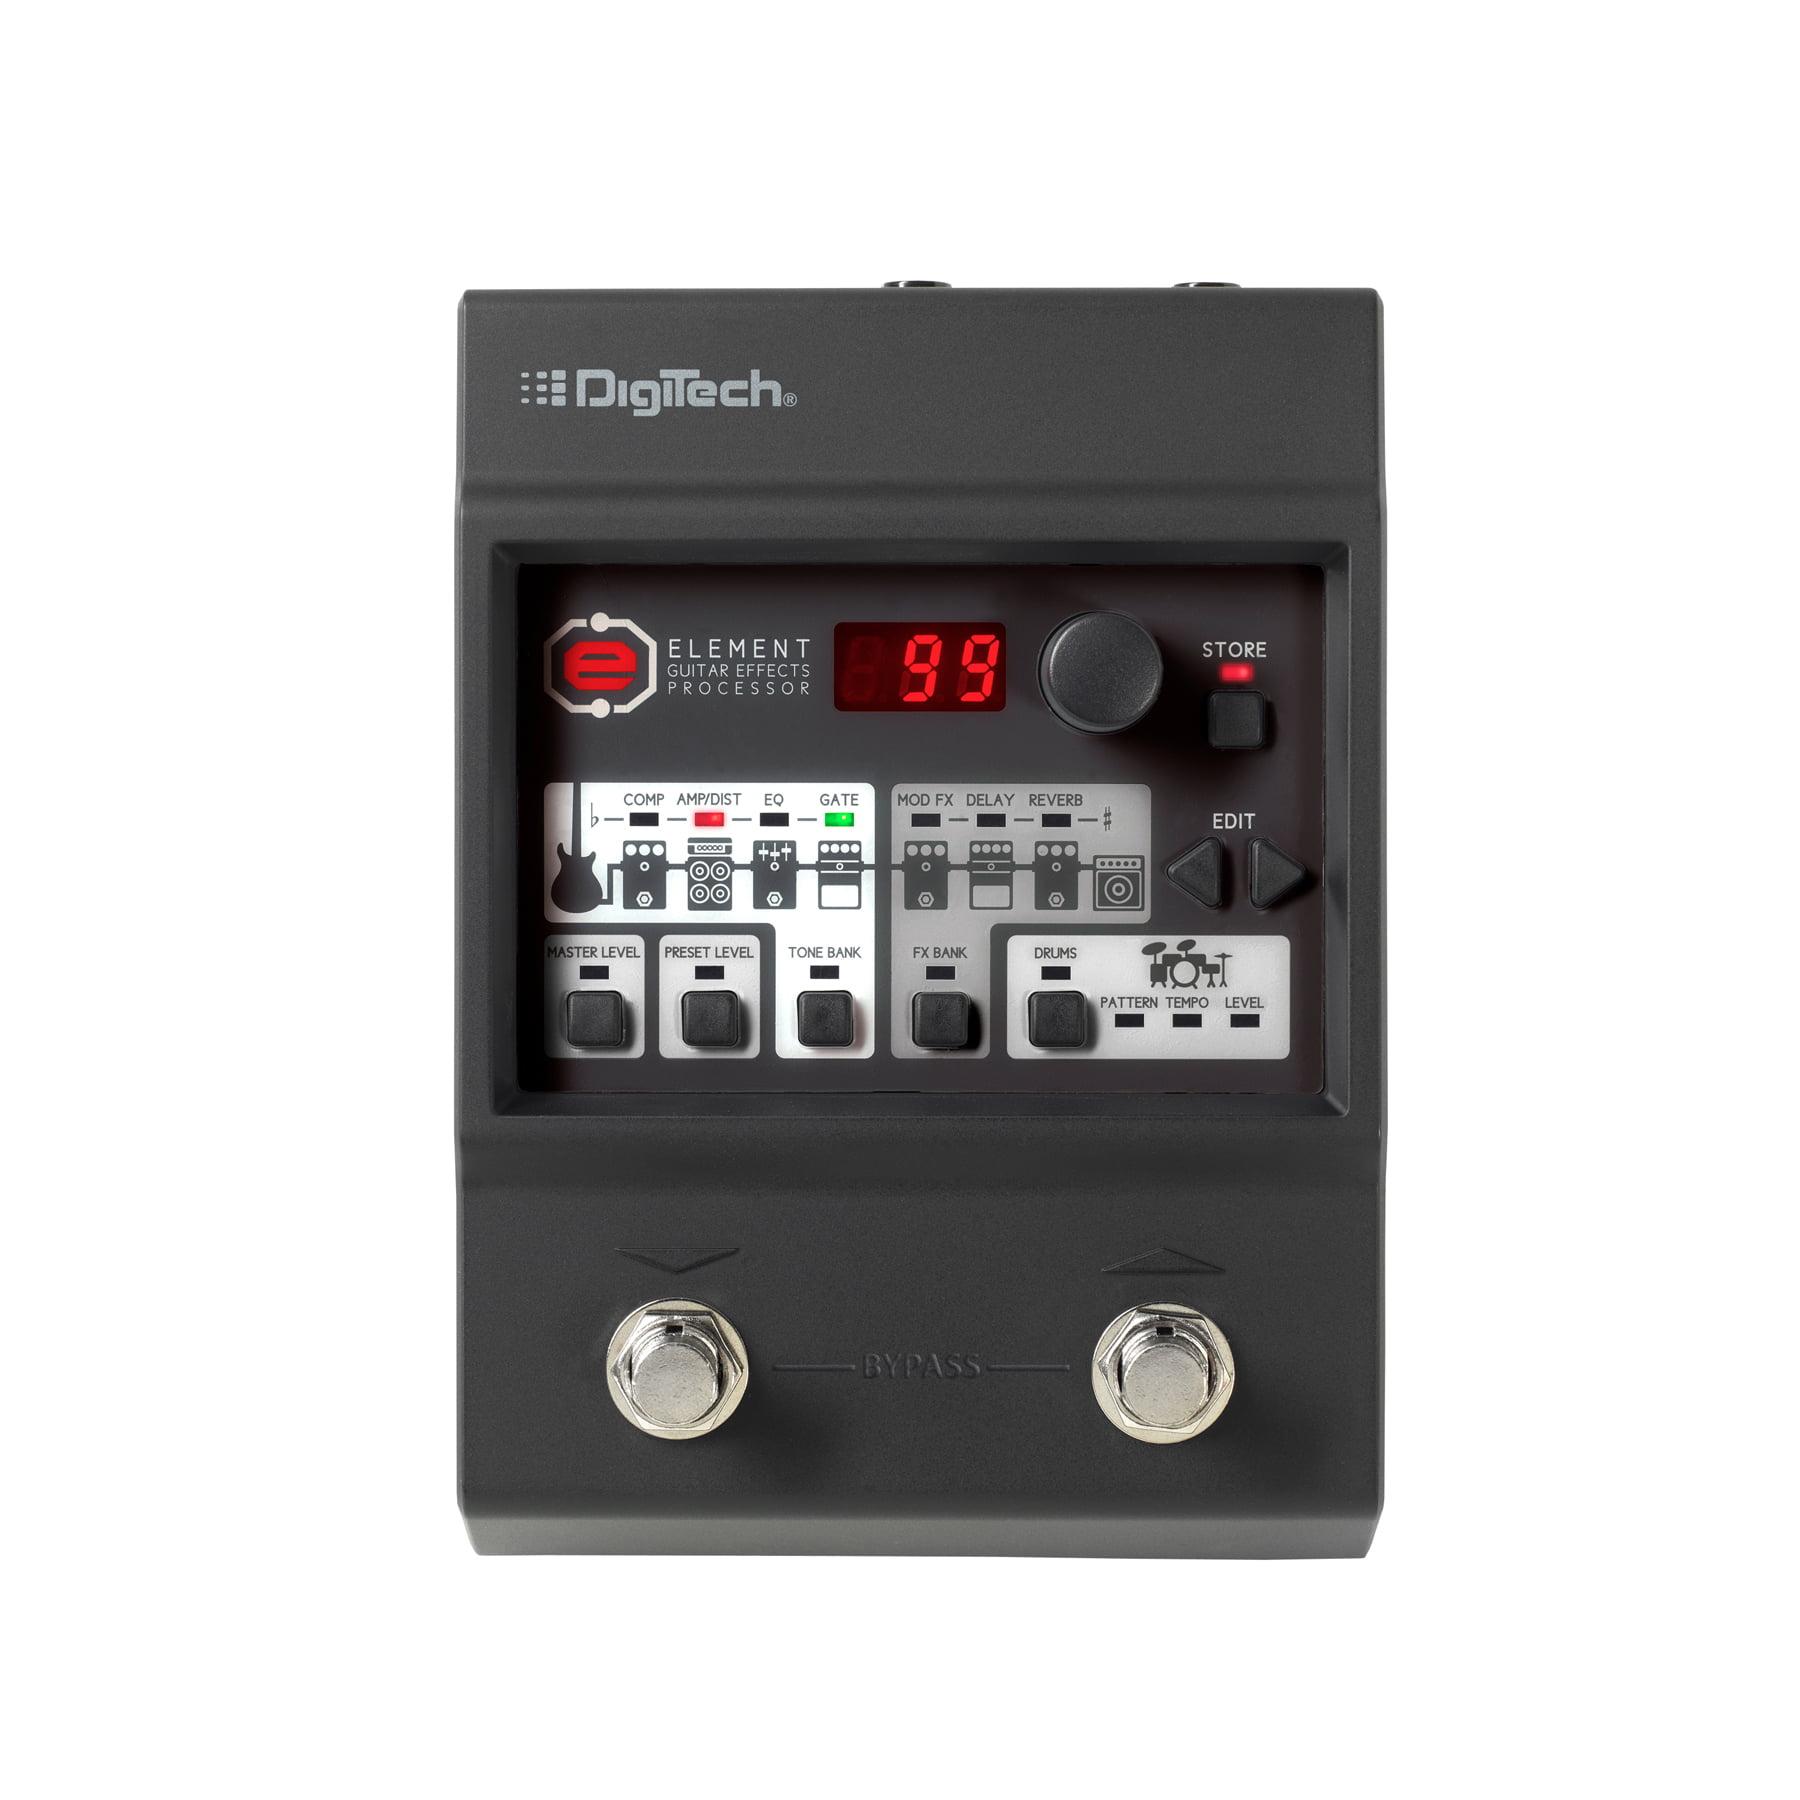 Digitech Element Multi Effect Processor for Guitar by DigiTech